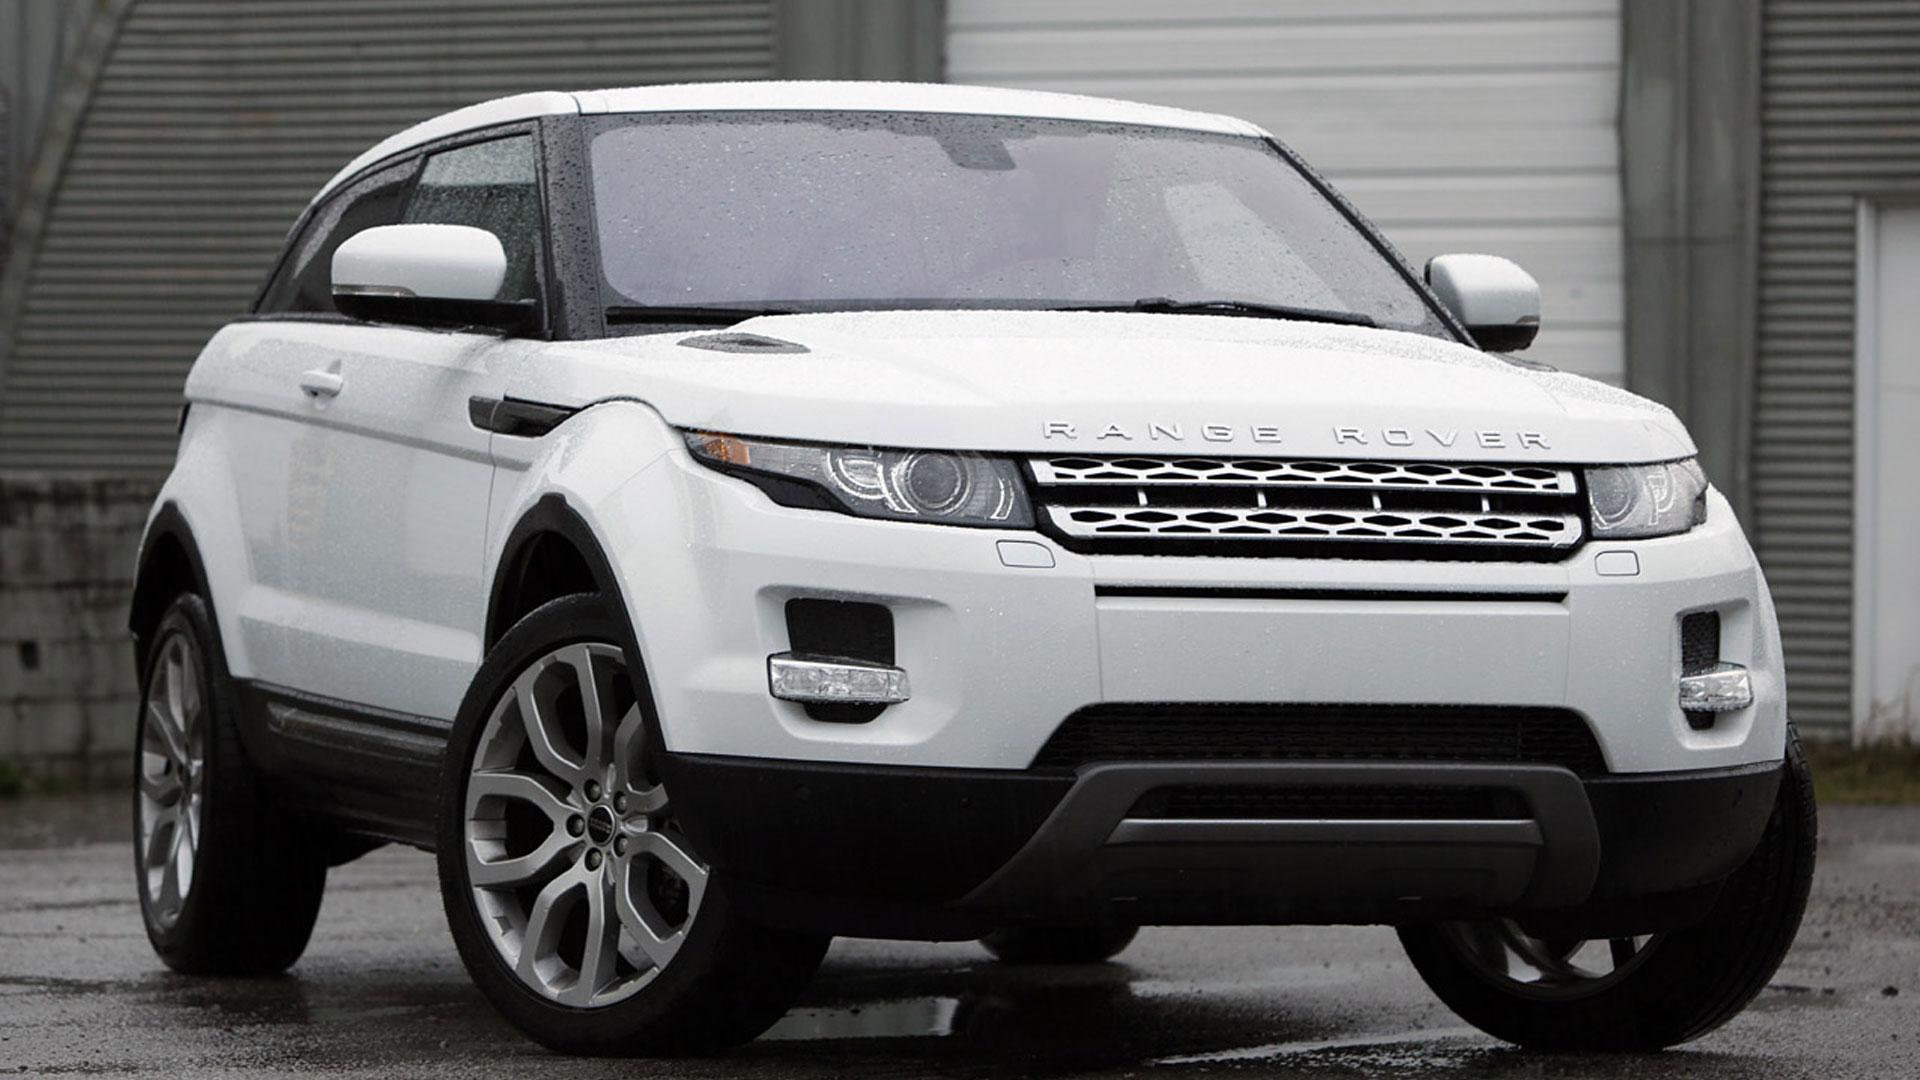 Range Rover Car Hd Wallpaper Download 2014 Range Rover Evoque Sport Cars